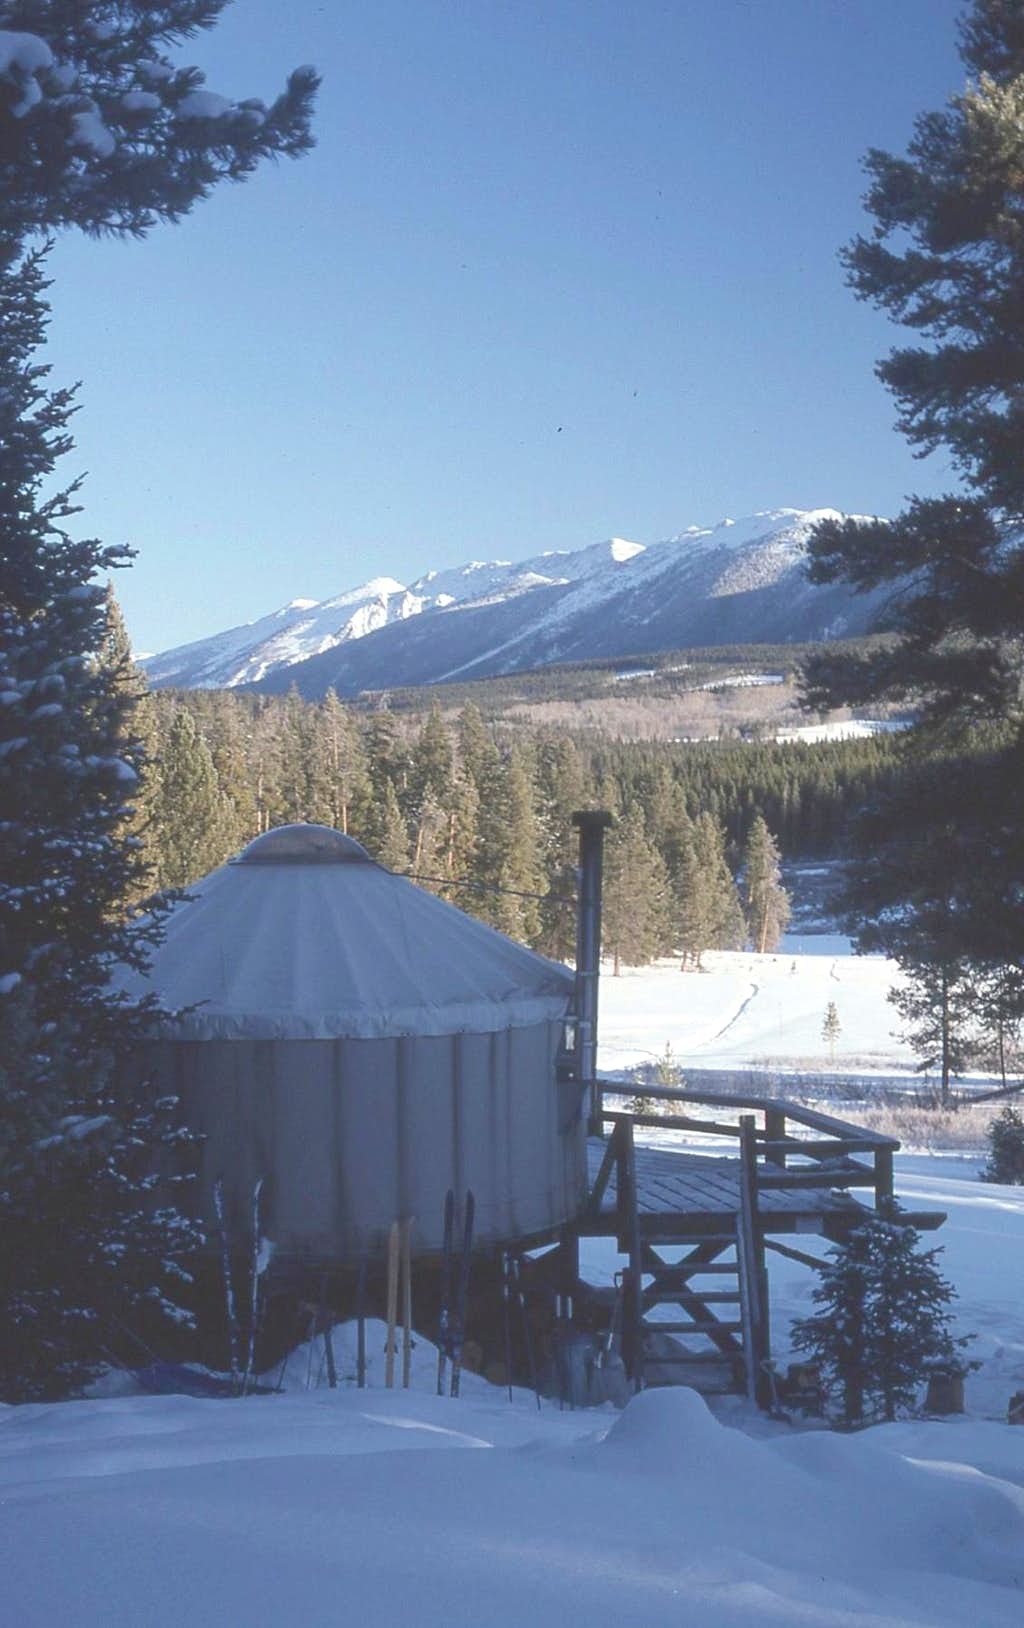 The Grass Creek Yurt